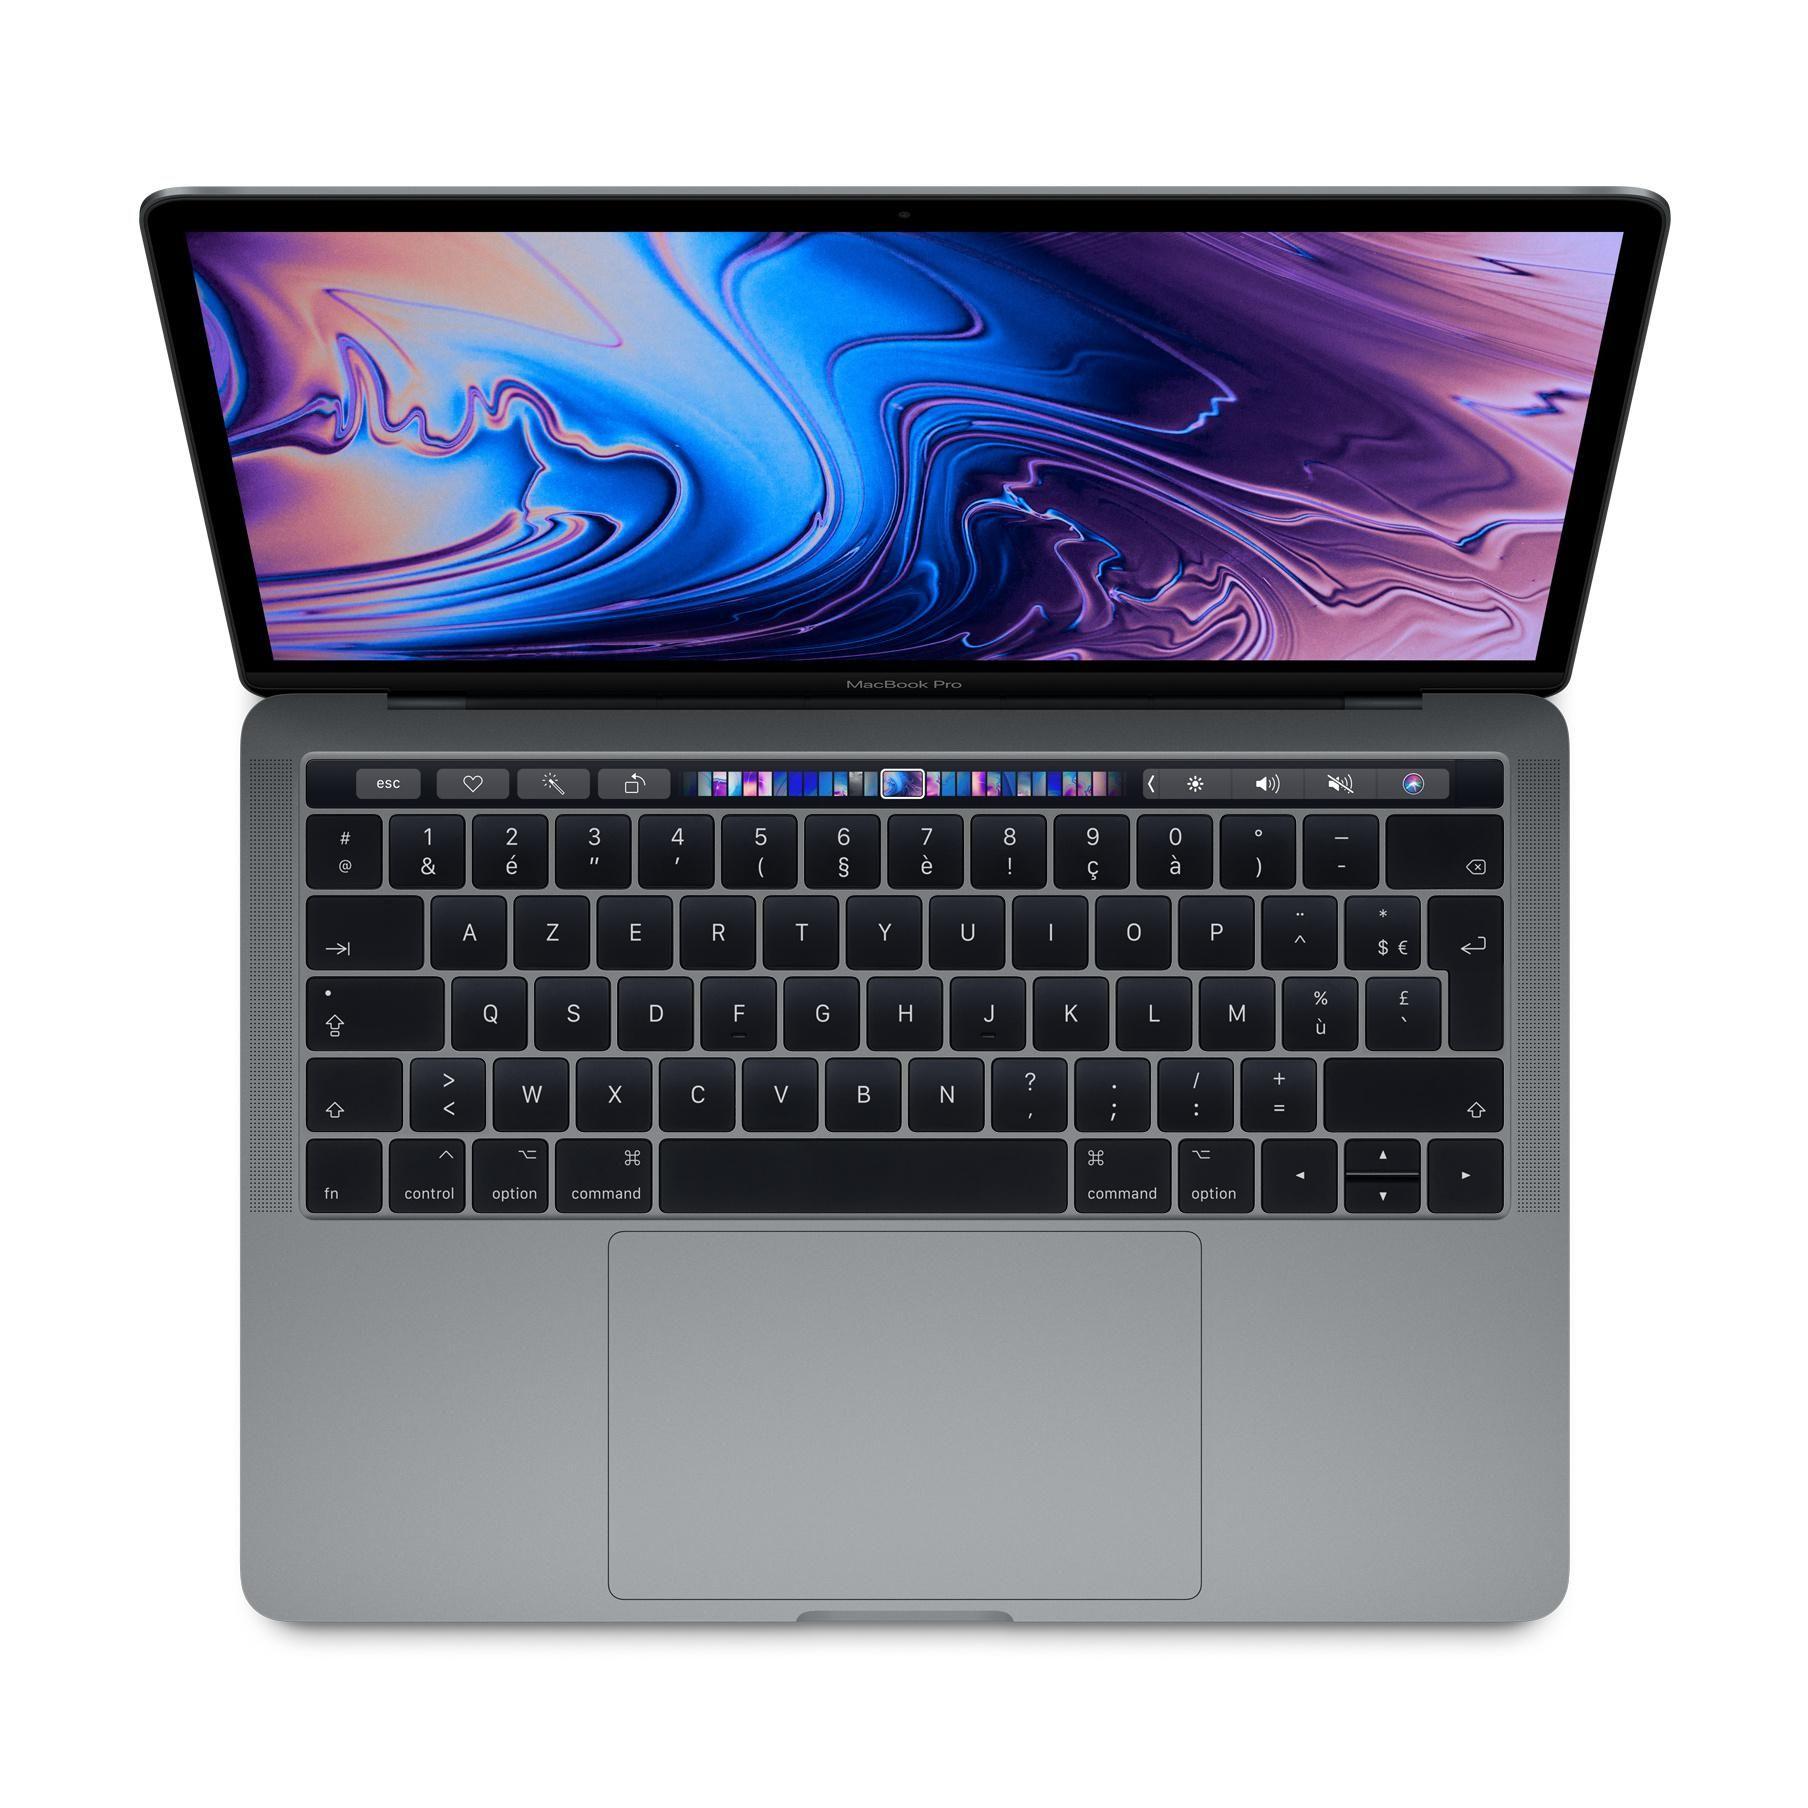 Macbook Pro Retina 13 3 Mid 2017 Core I5 Ram 8gb Ssd 512 Gb Refurbished In 2020 Buy Macbook Macbook Pro Keyboard Macbook Pro 13 Inch